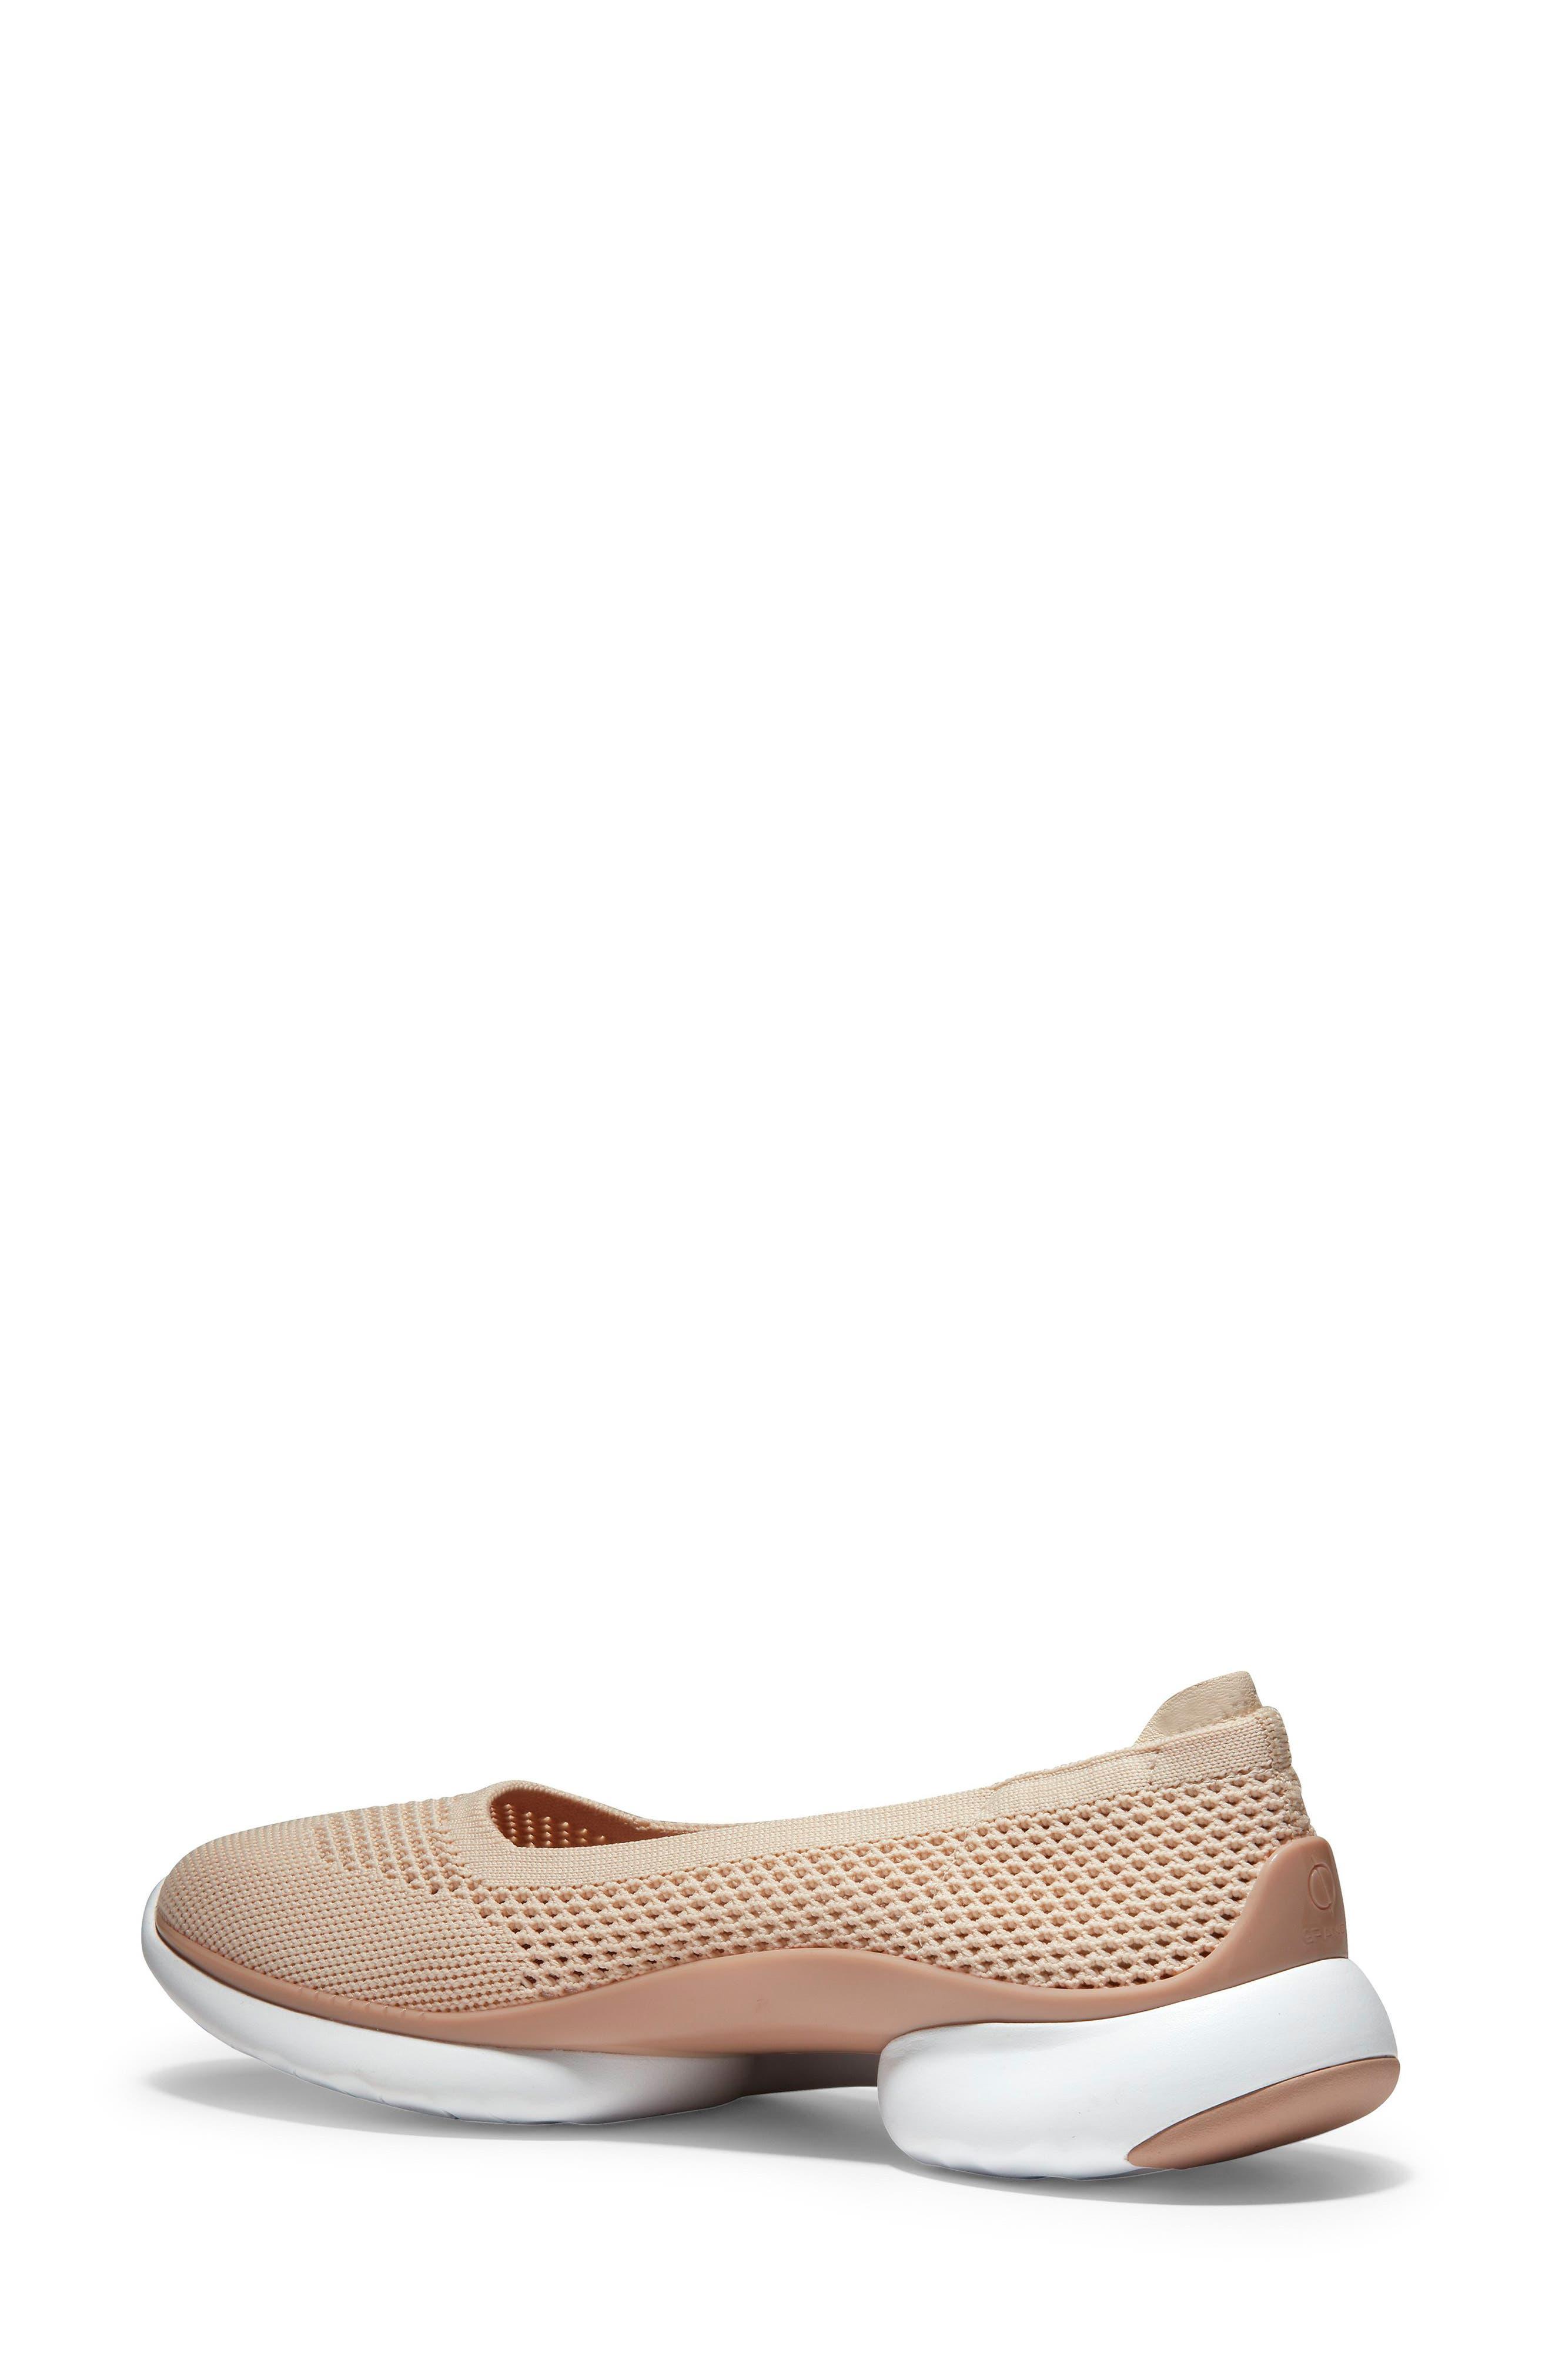 ZeroGrand Knit Sneaker,                             Alternate thumbnail 2, color,                             SAND/ ROSE KNIT/ LEATHER